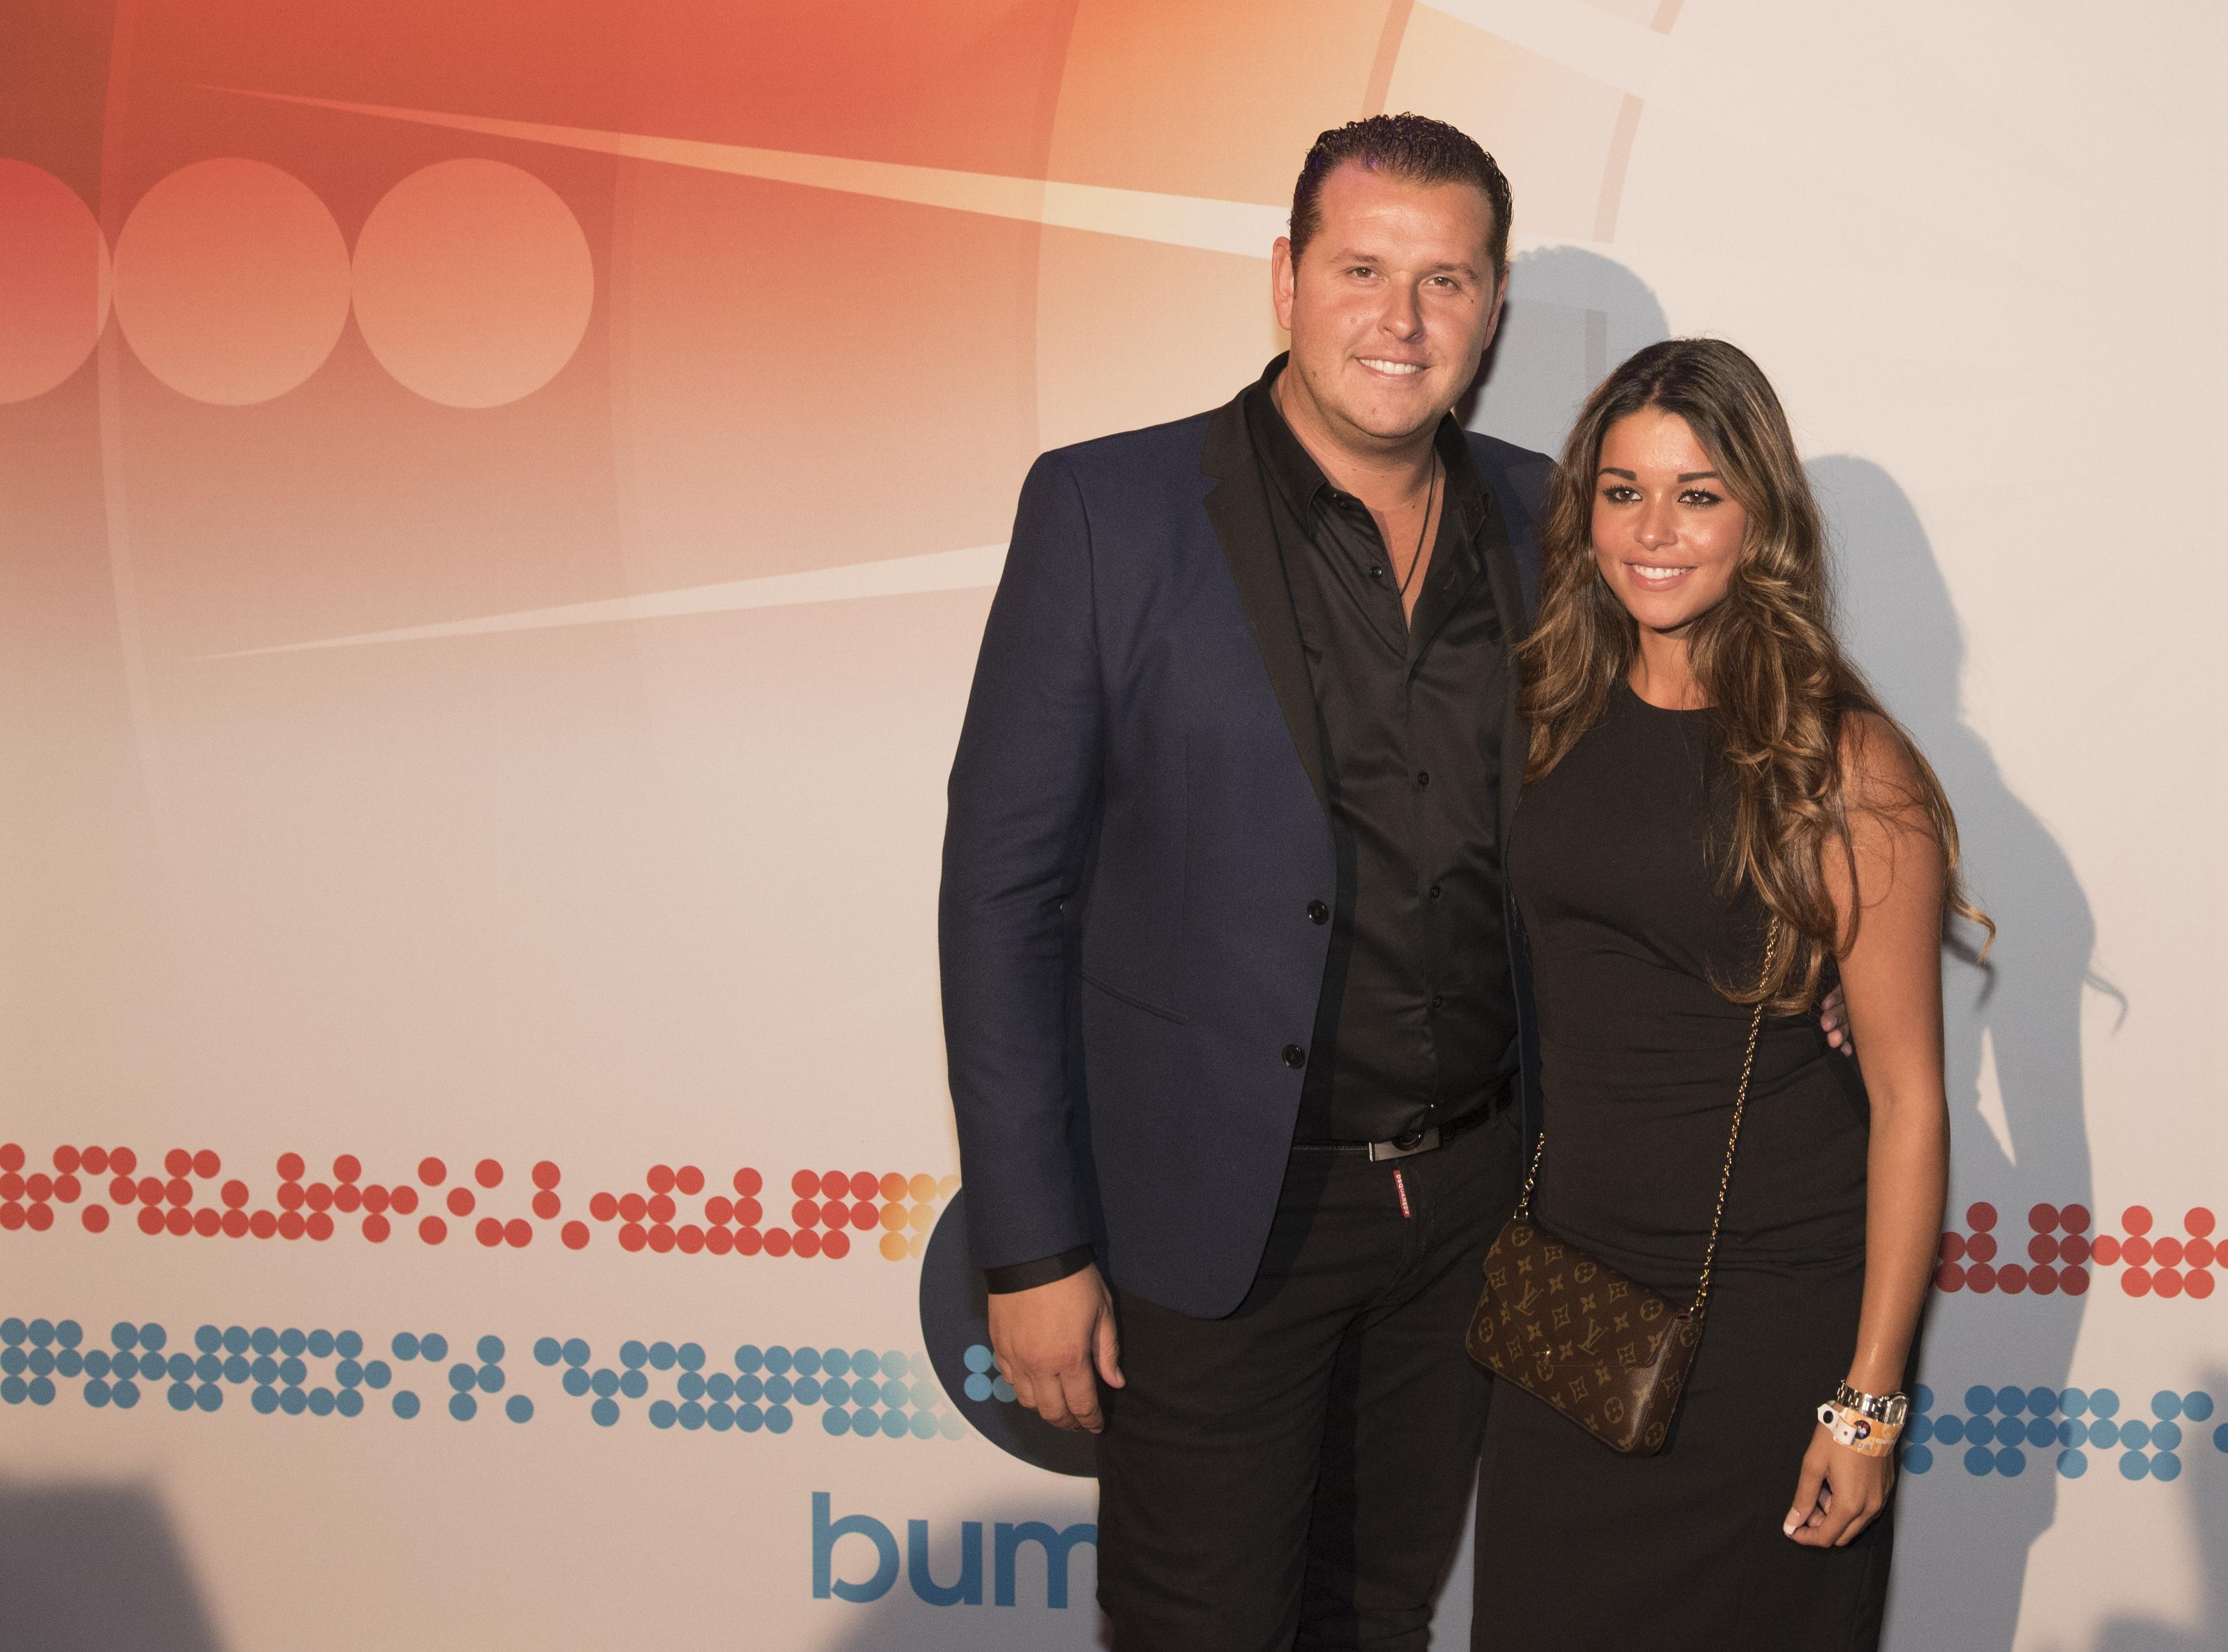 Stef Ekkel en partner tijdens Buma NL Awards 2017 - Fotocredits: Shali Blok (ArtiestenNieuws)